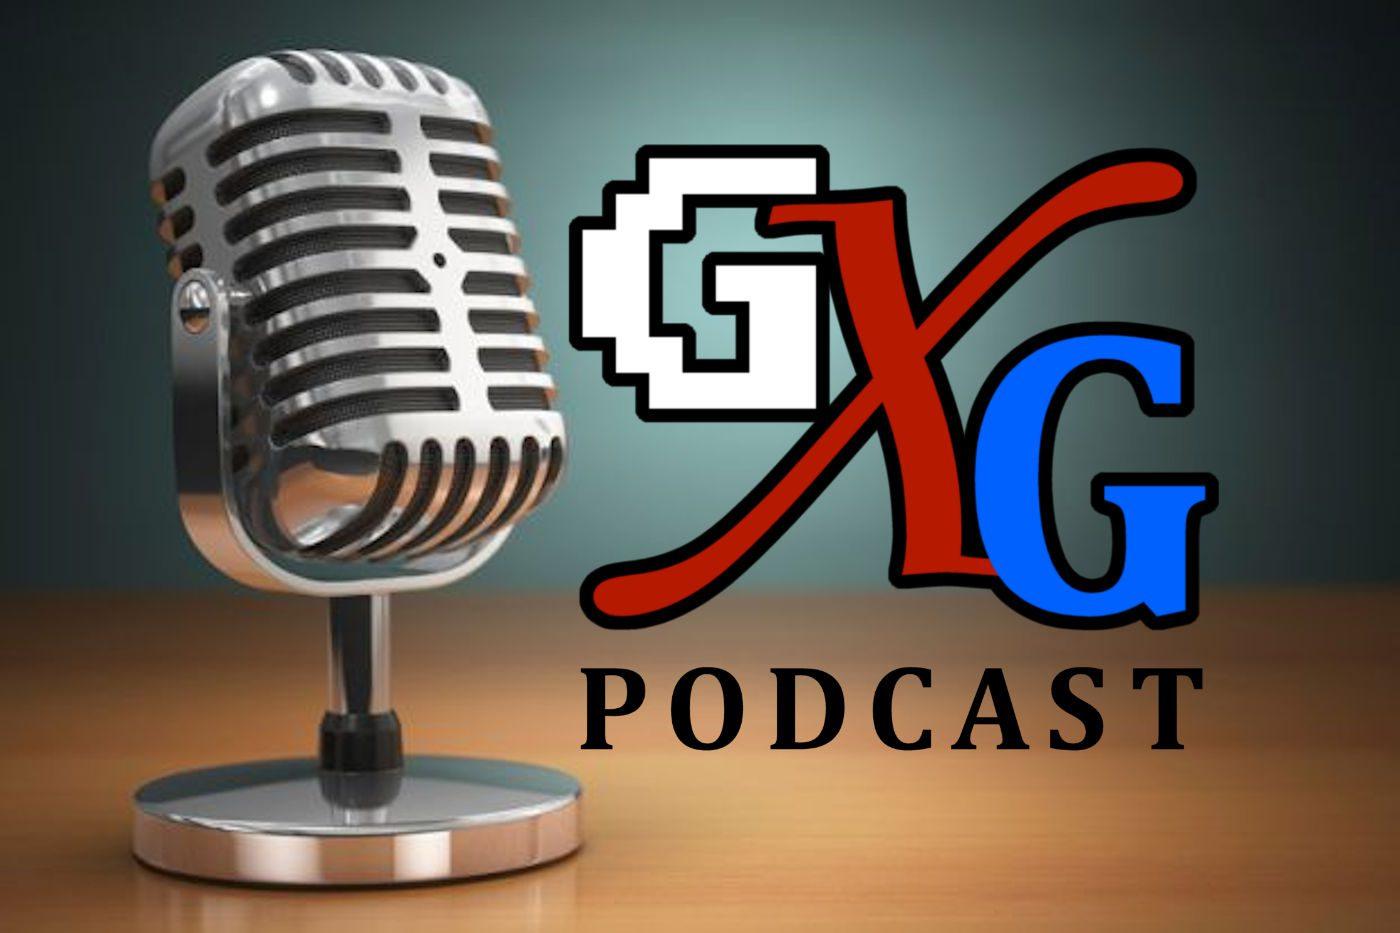 GenXGrownUp: Tomb Raider, DJI Osmo Mobile, & Alto's Odyssey